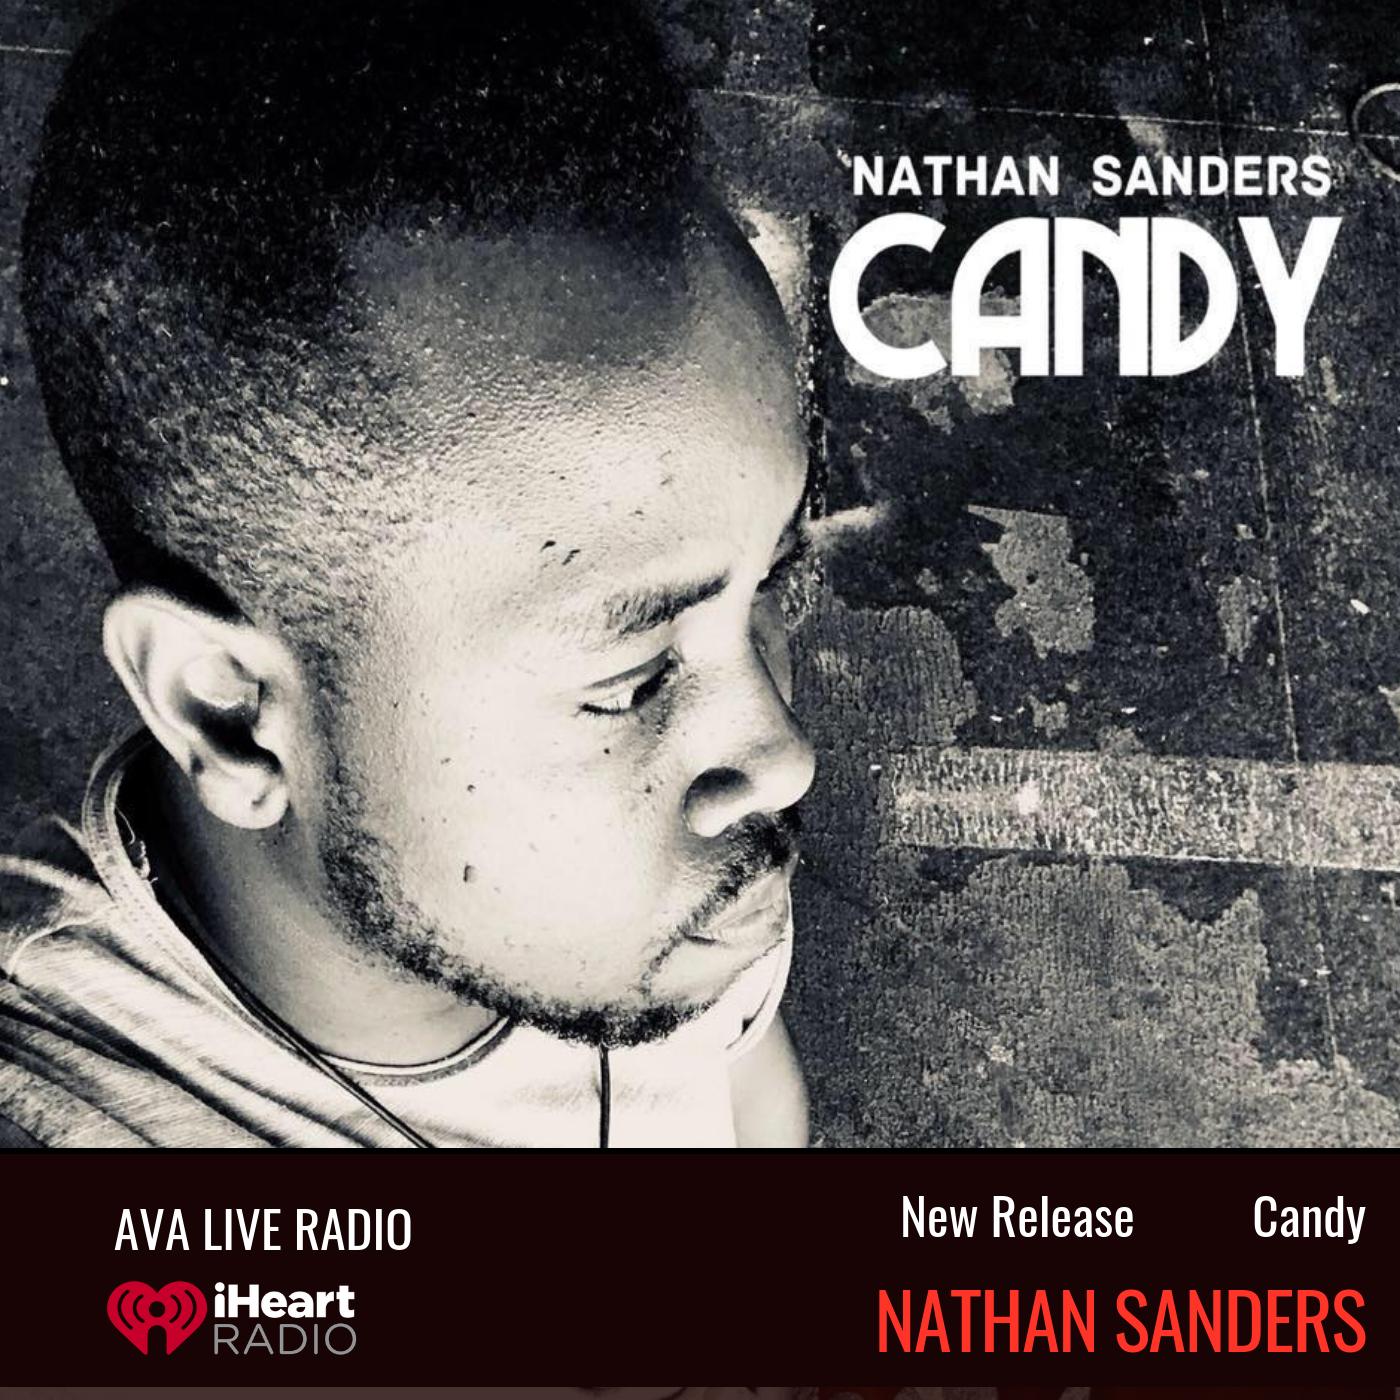 Nathan Sanders avaliveradio.png